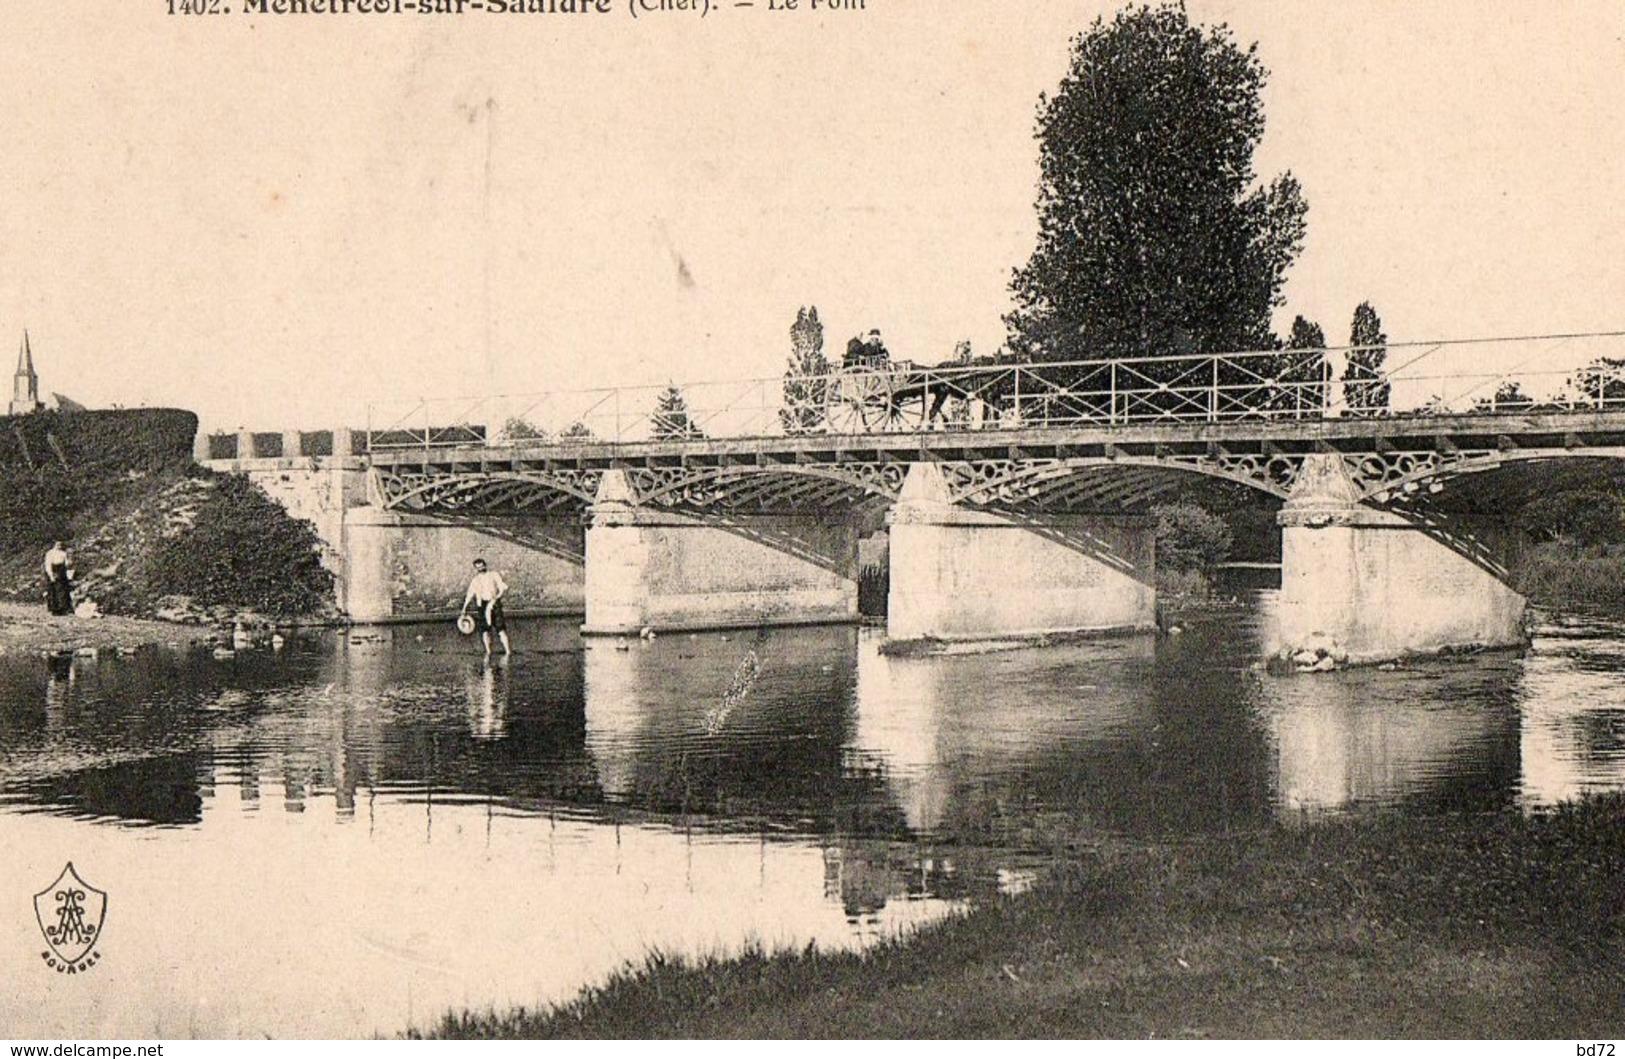 MENETREOL SUR SAULDRE ( 18 ) - Le Pont - Other Municipalities